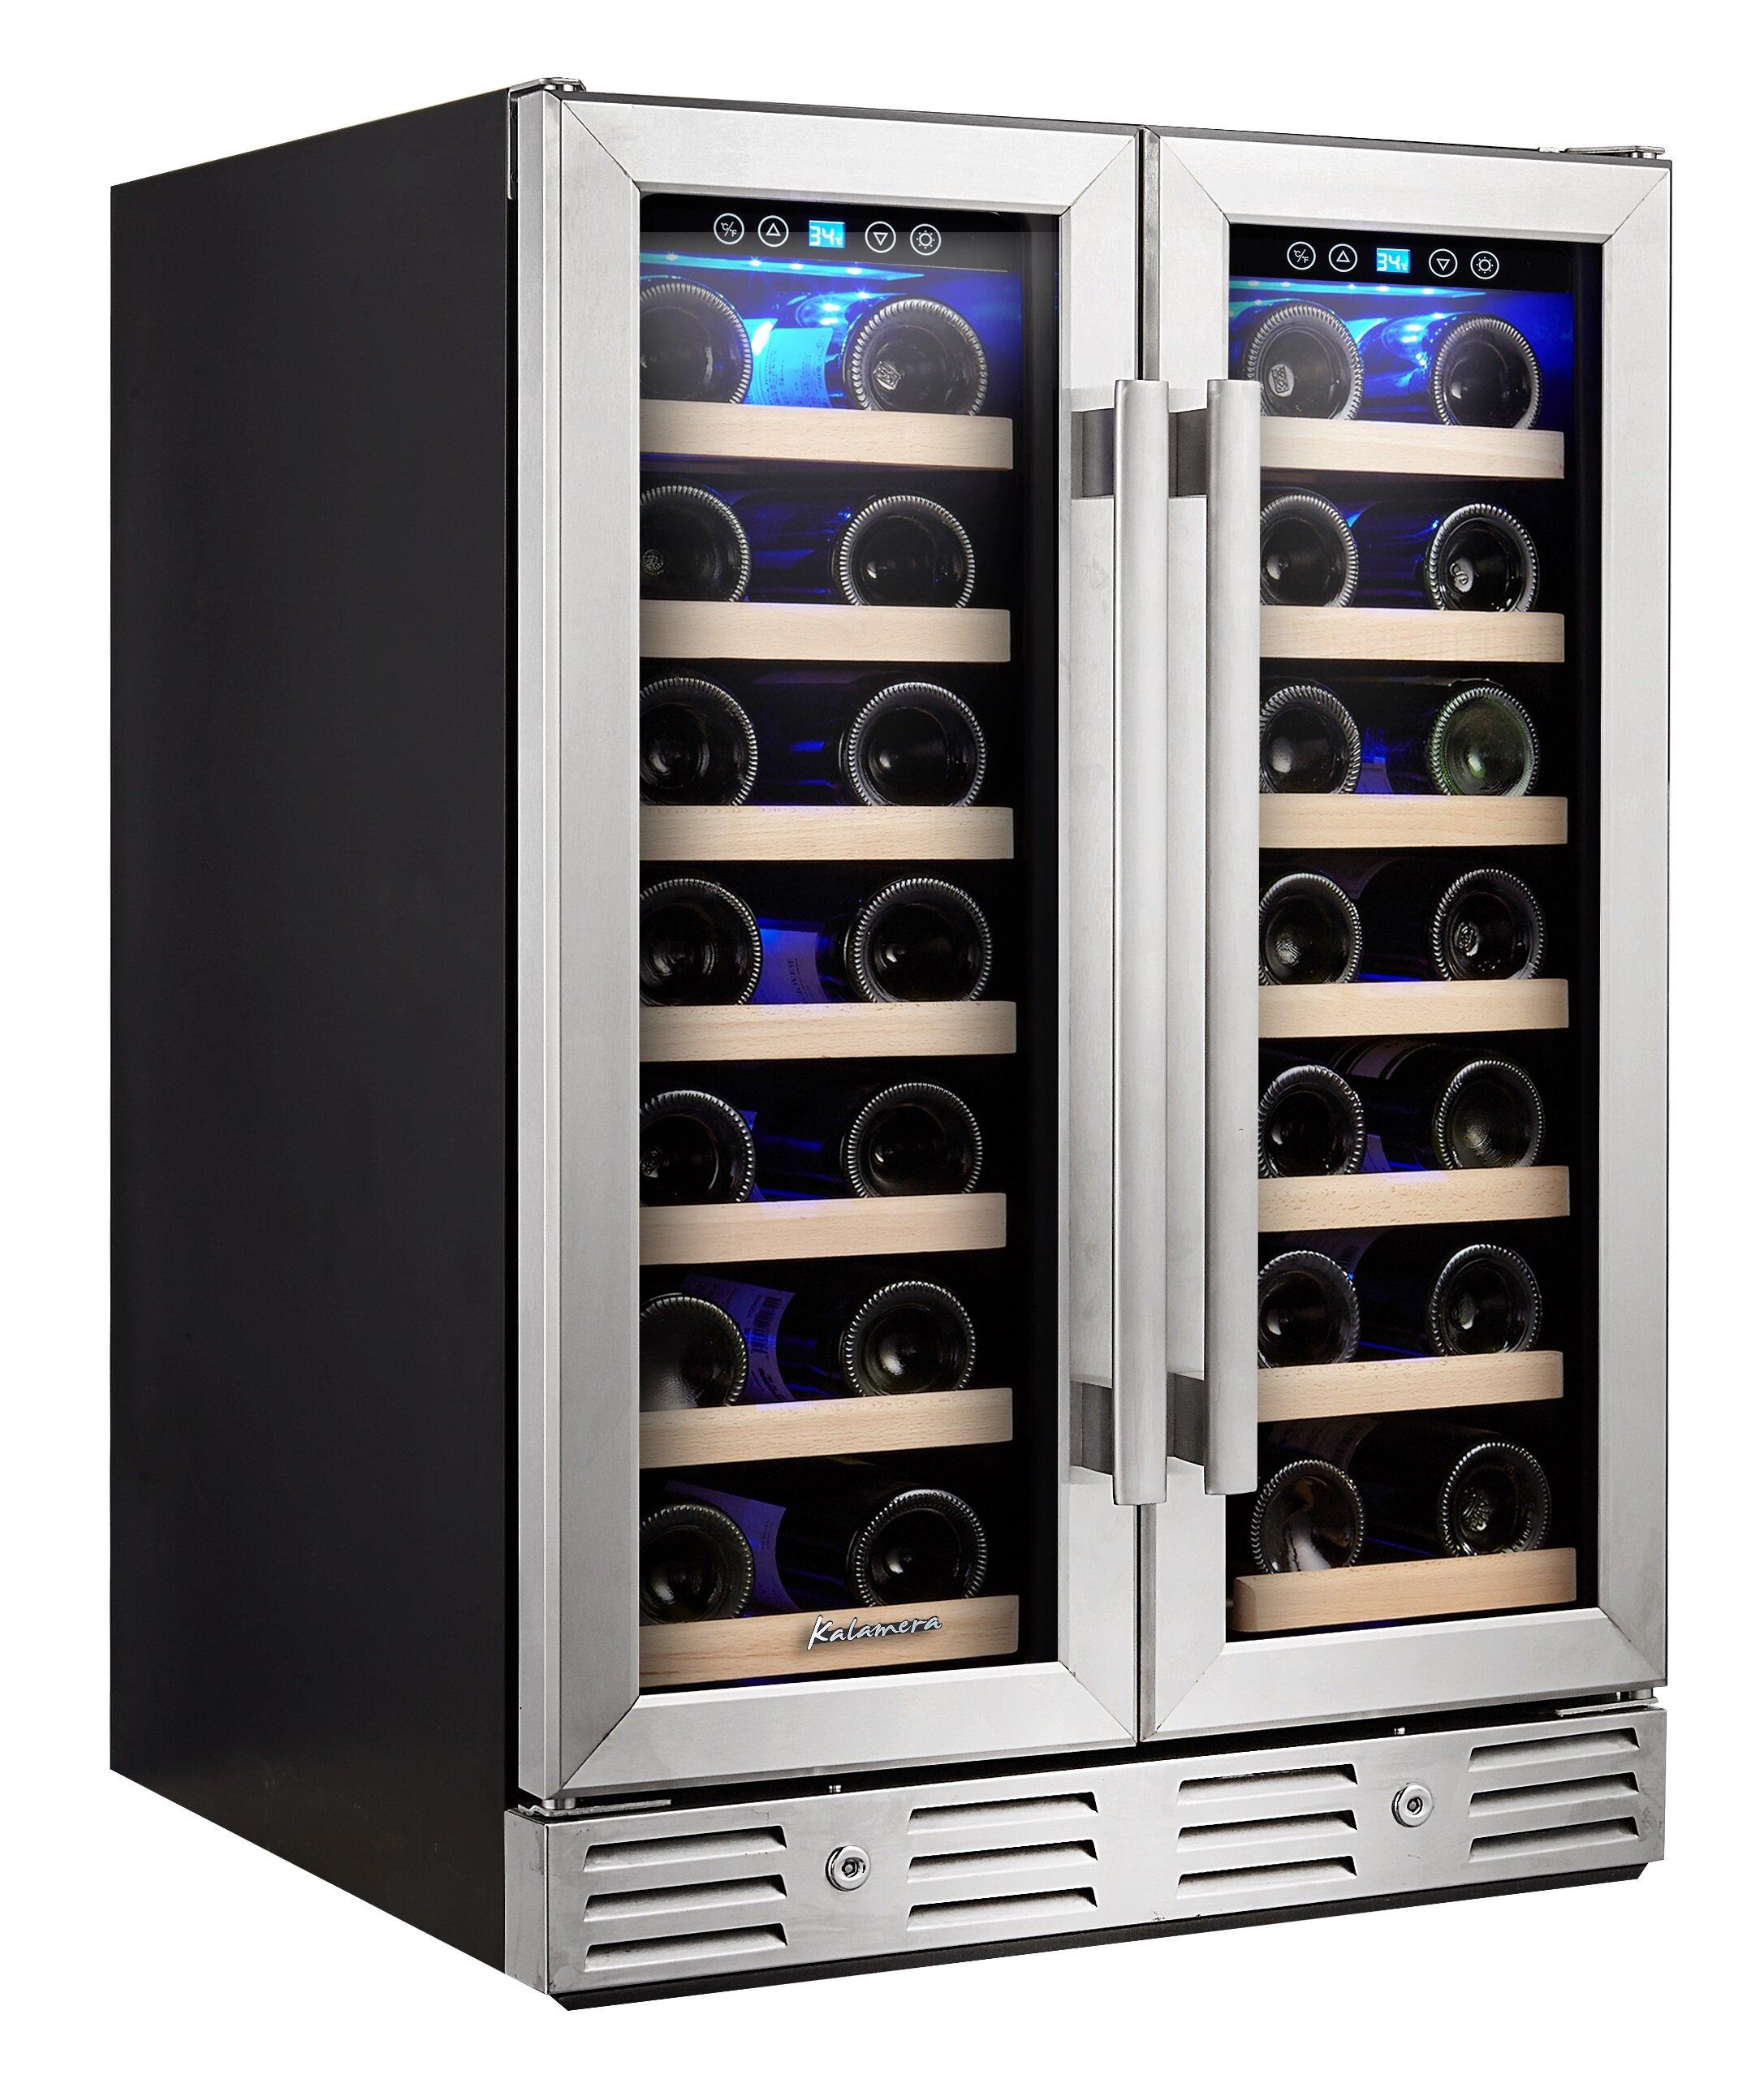 COOL-01 1 Bottle Styrofoam Wine Shipping Cooler